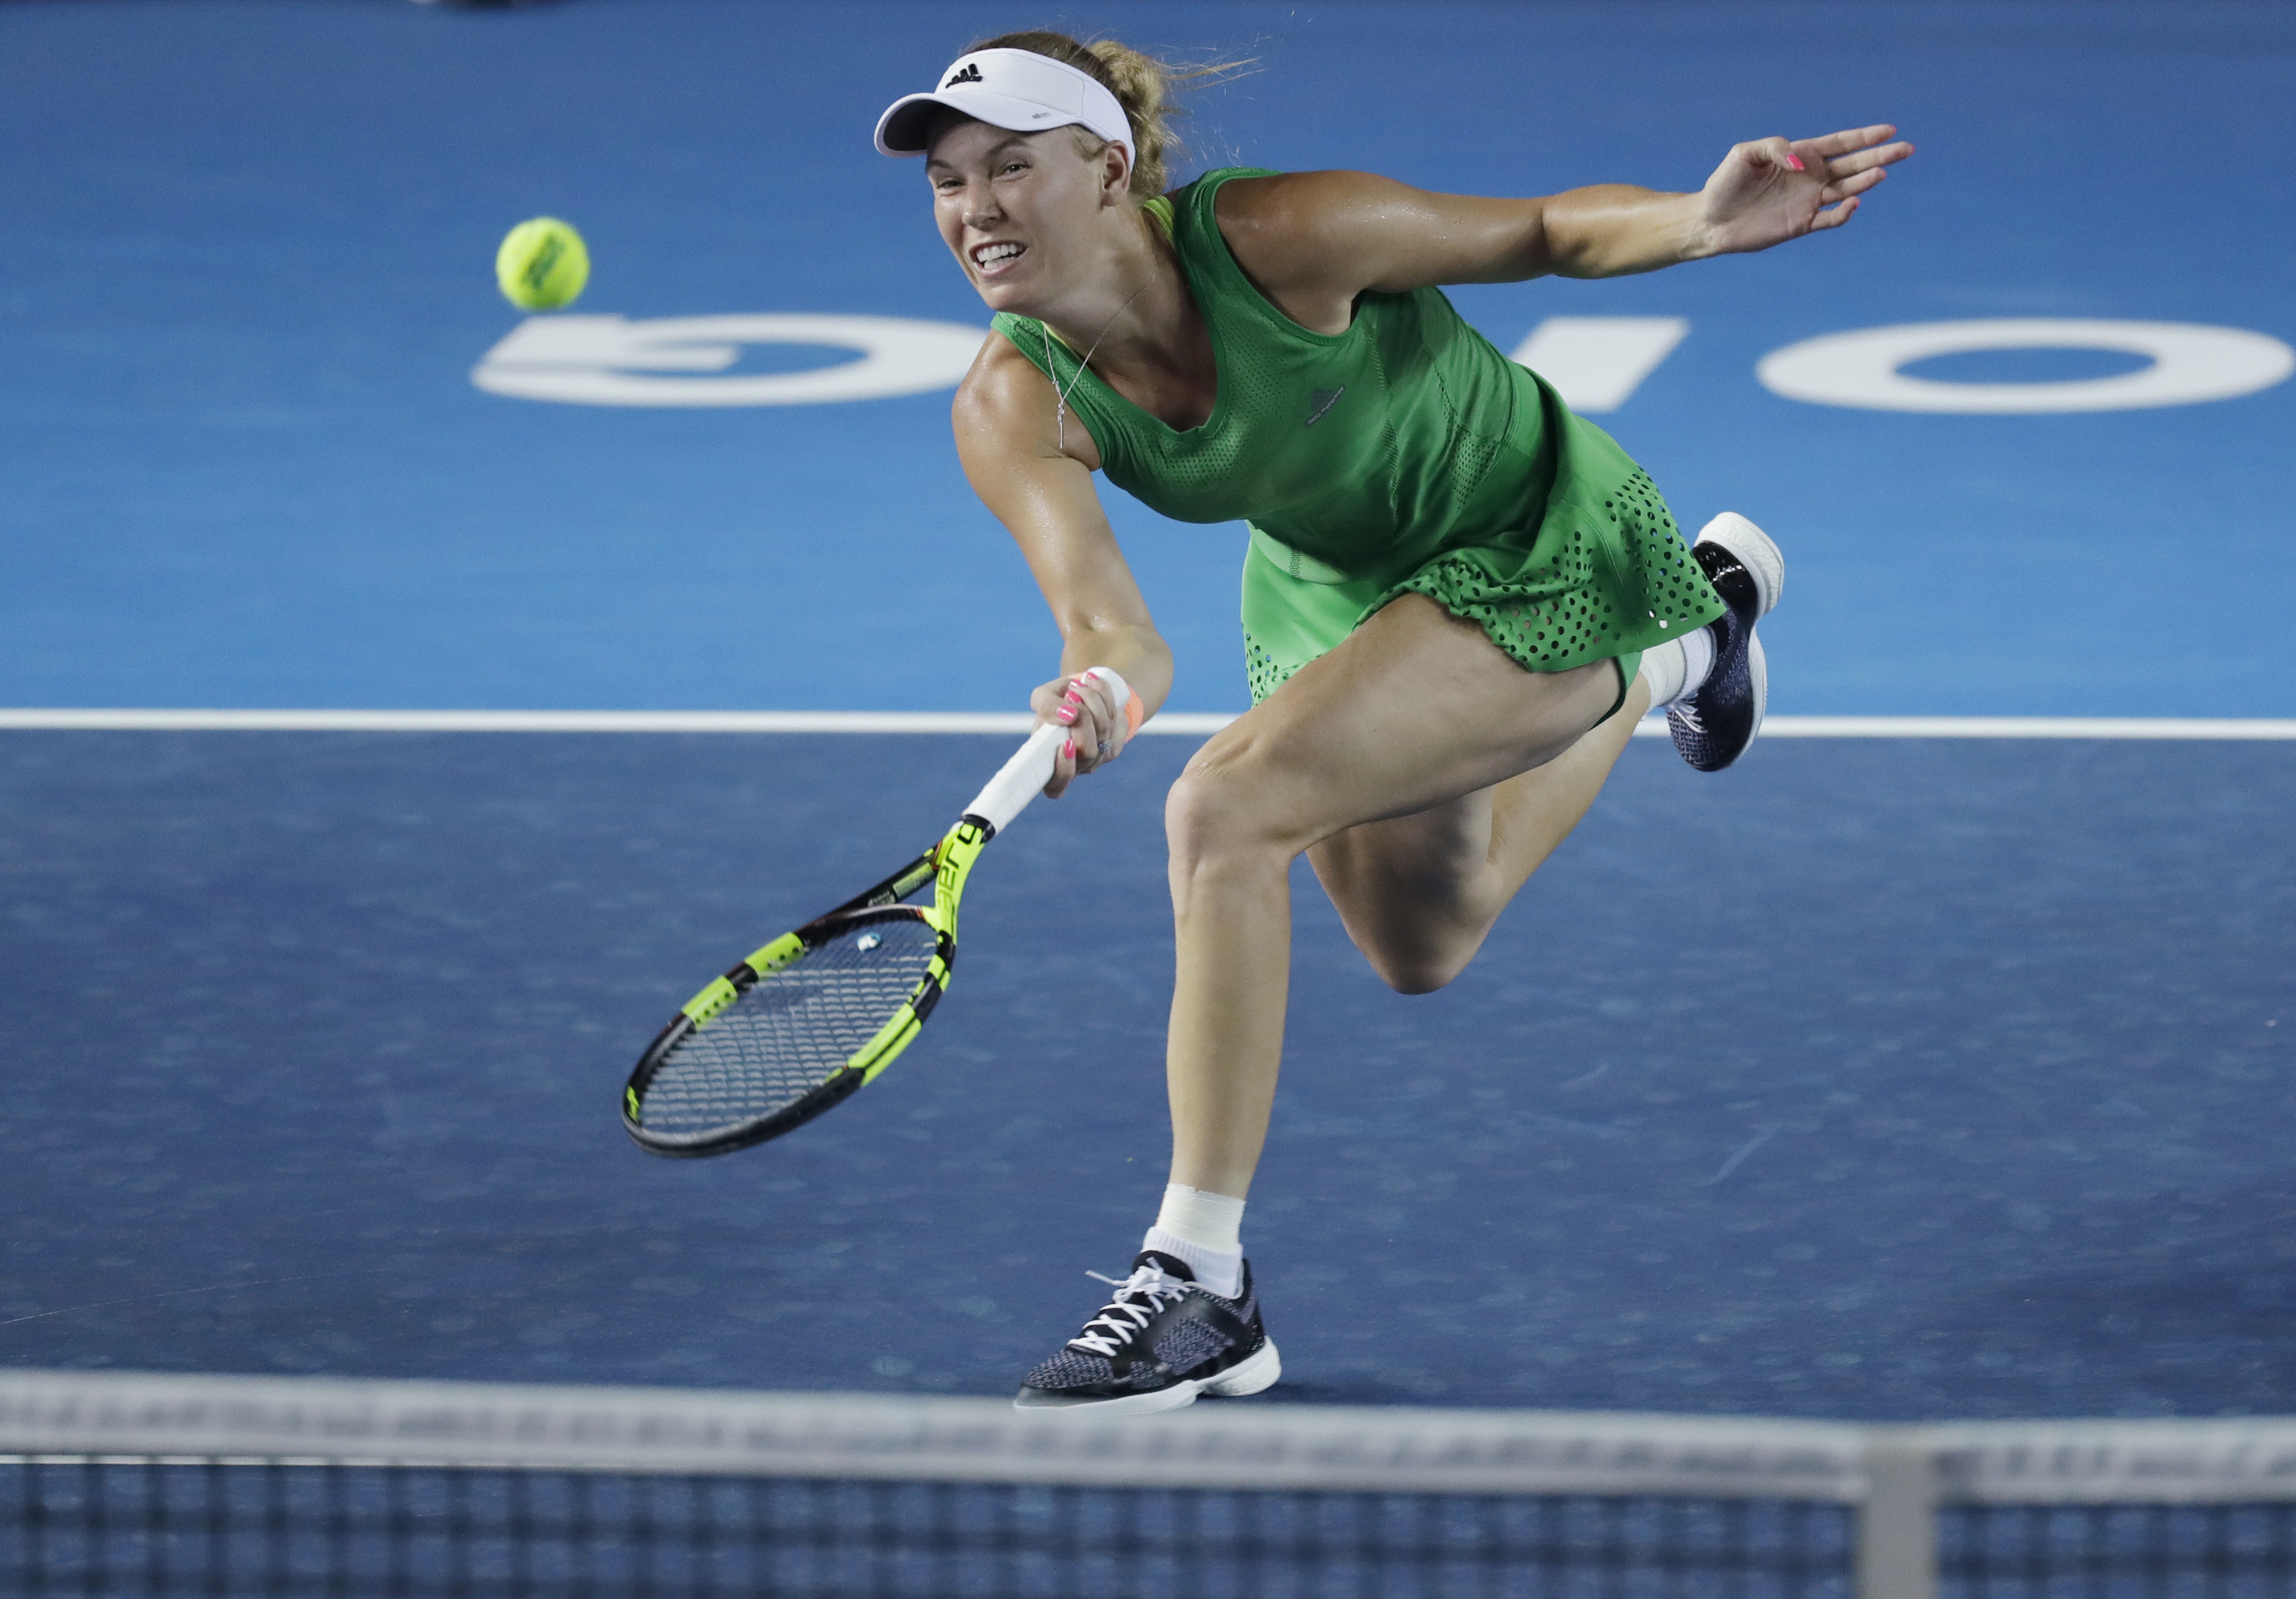 Caroline Wozniacki of Denmark returns a shot to Jelena Jankovic of Serbia during the semi-final match at the Hong Kong Open tennis tournament in Hong Kong, Saturday, Oct. 15, 2016. (AP Photo/Kin Cheung)